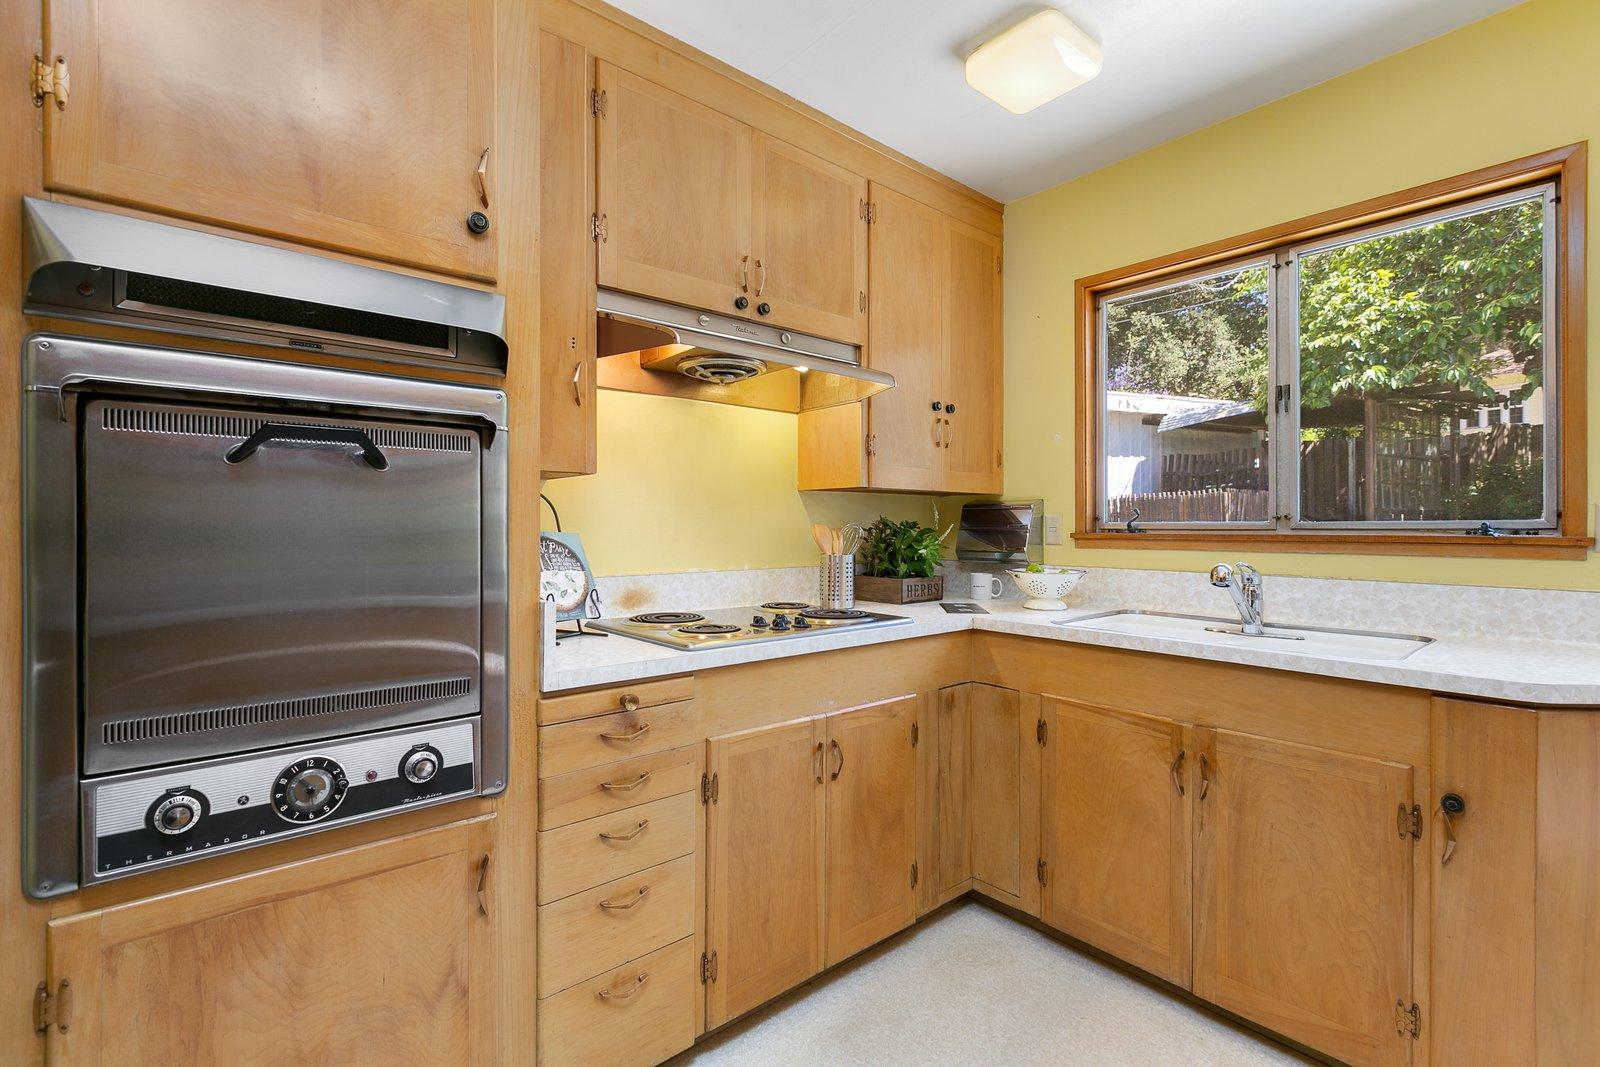 1960 PCC Case Study House #11 kitchen